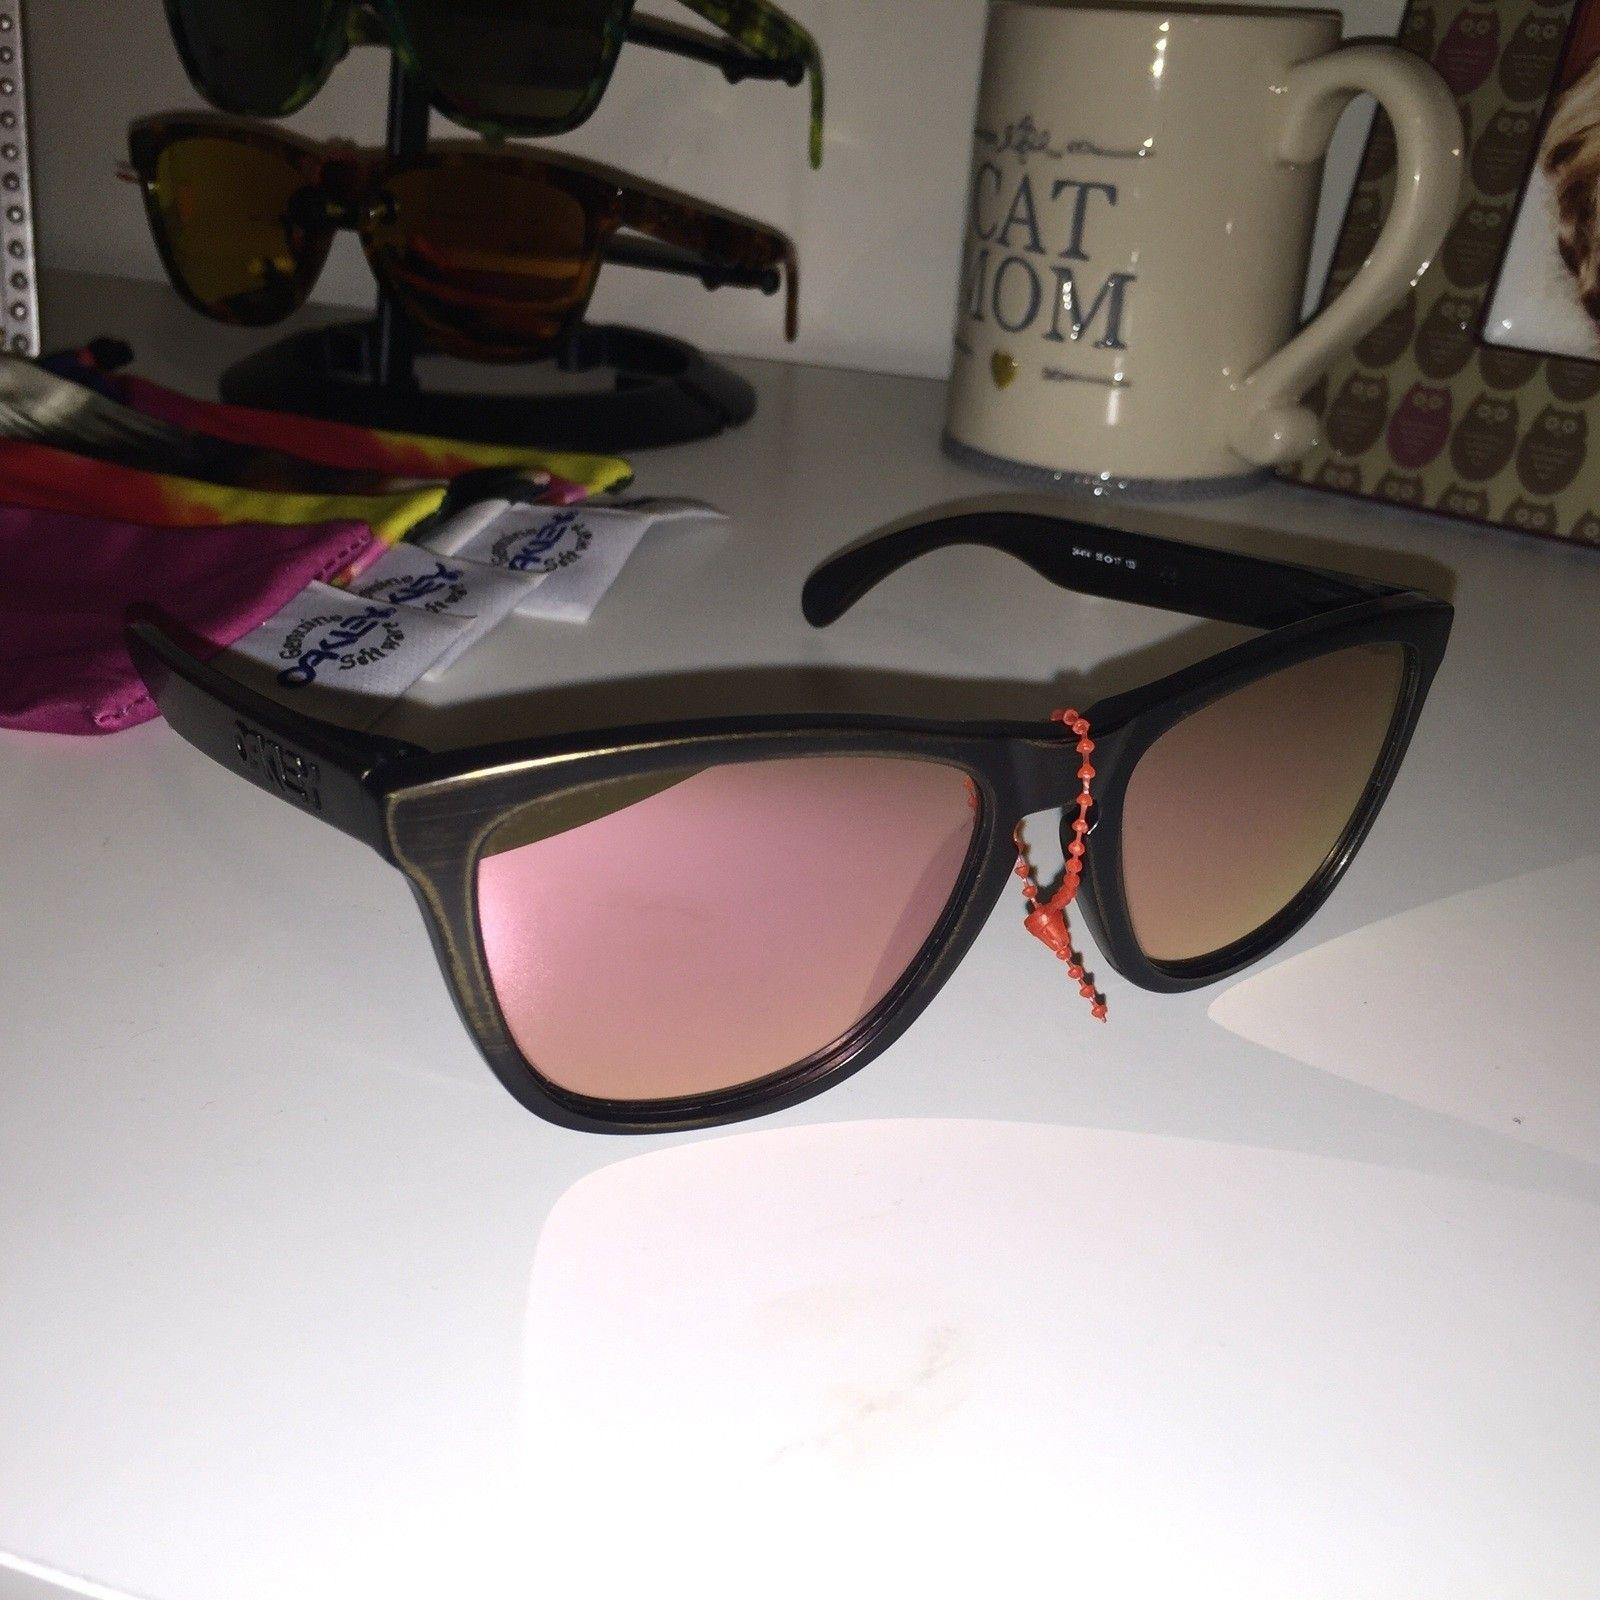 Finally got my pink irid! - image.jpg